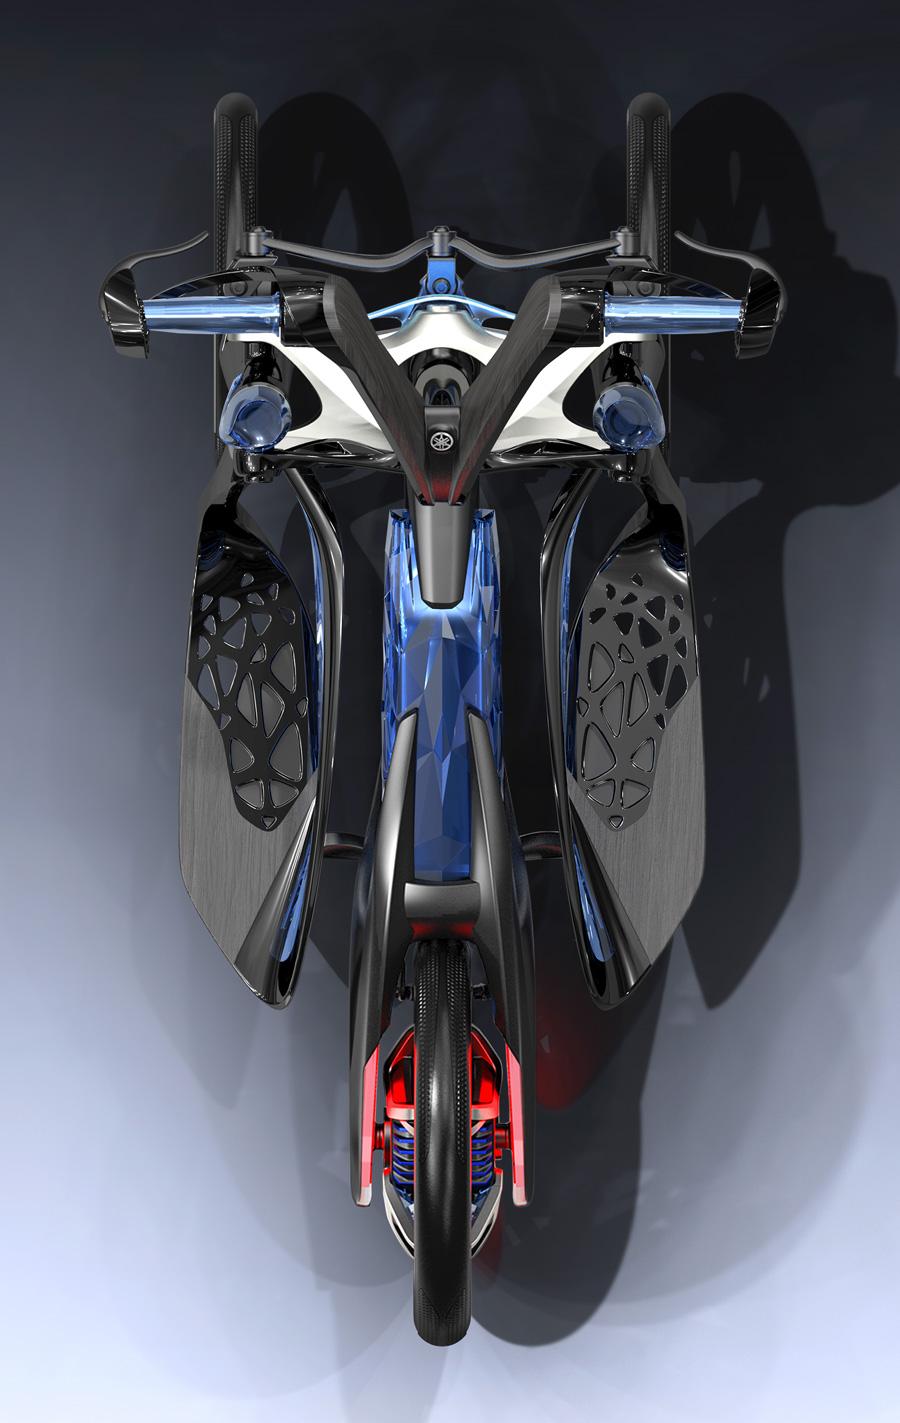 Tritown yamaha motor design yamaha motor co ltd for Yamaha motor com parts